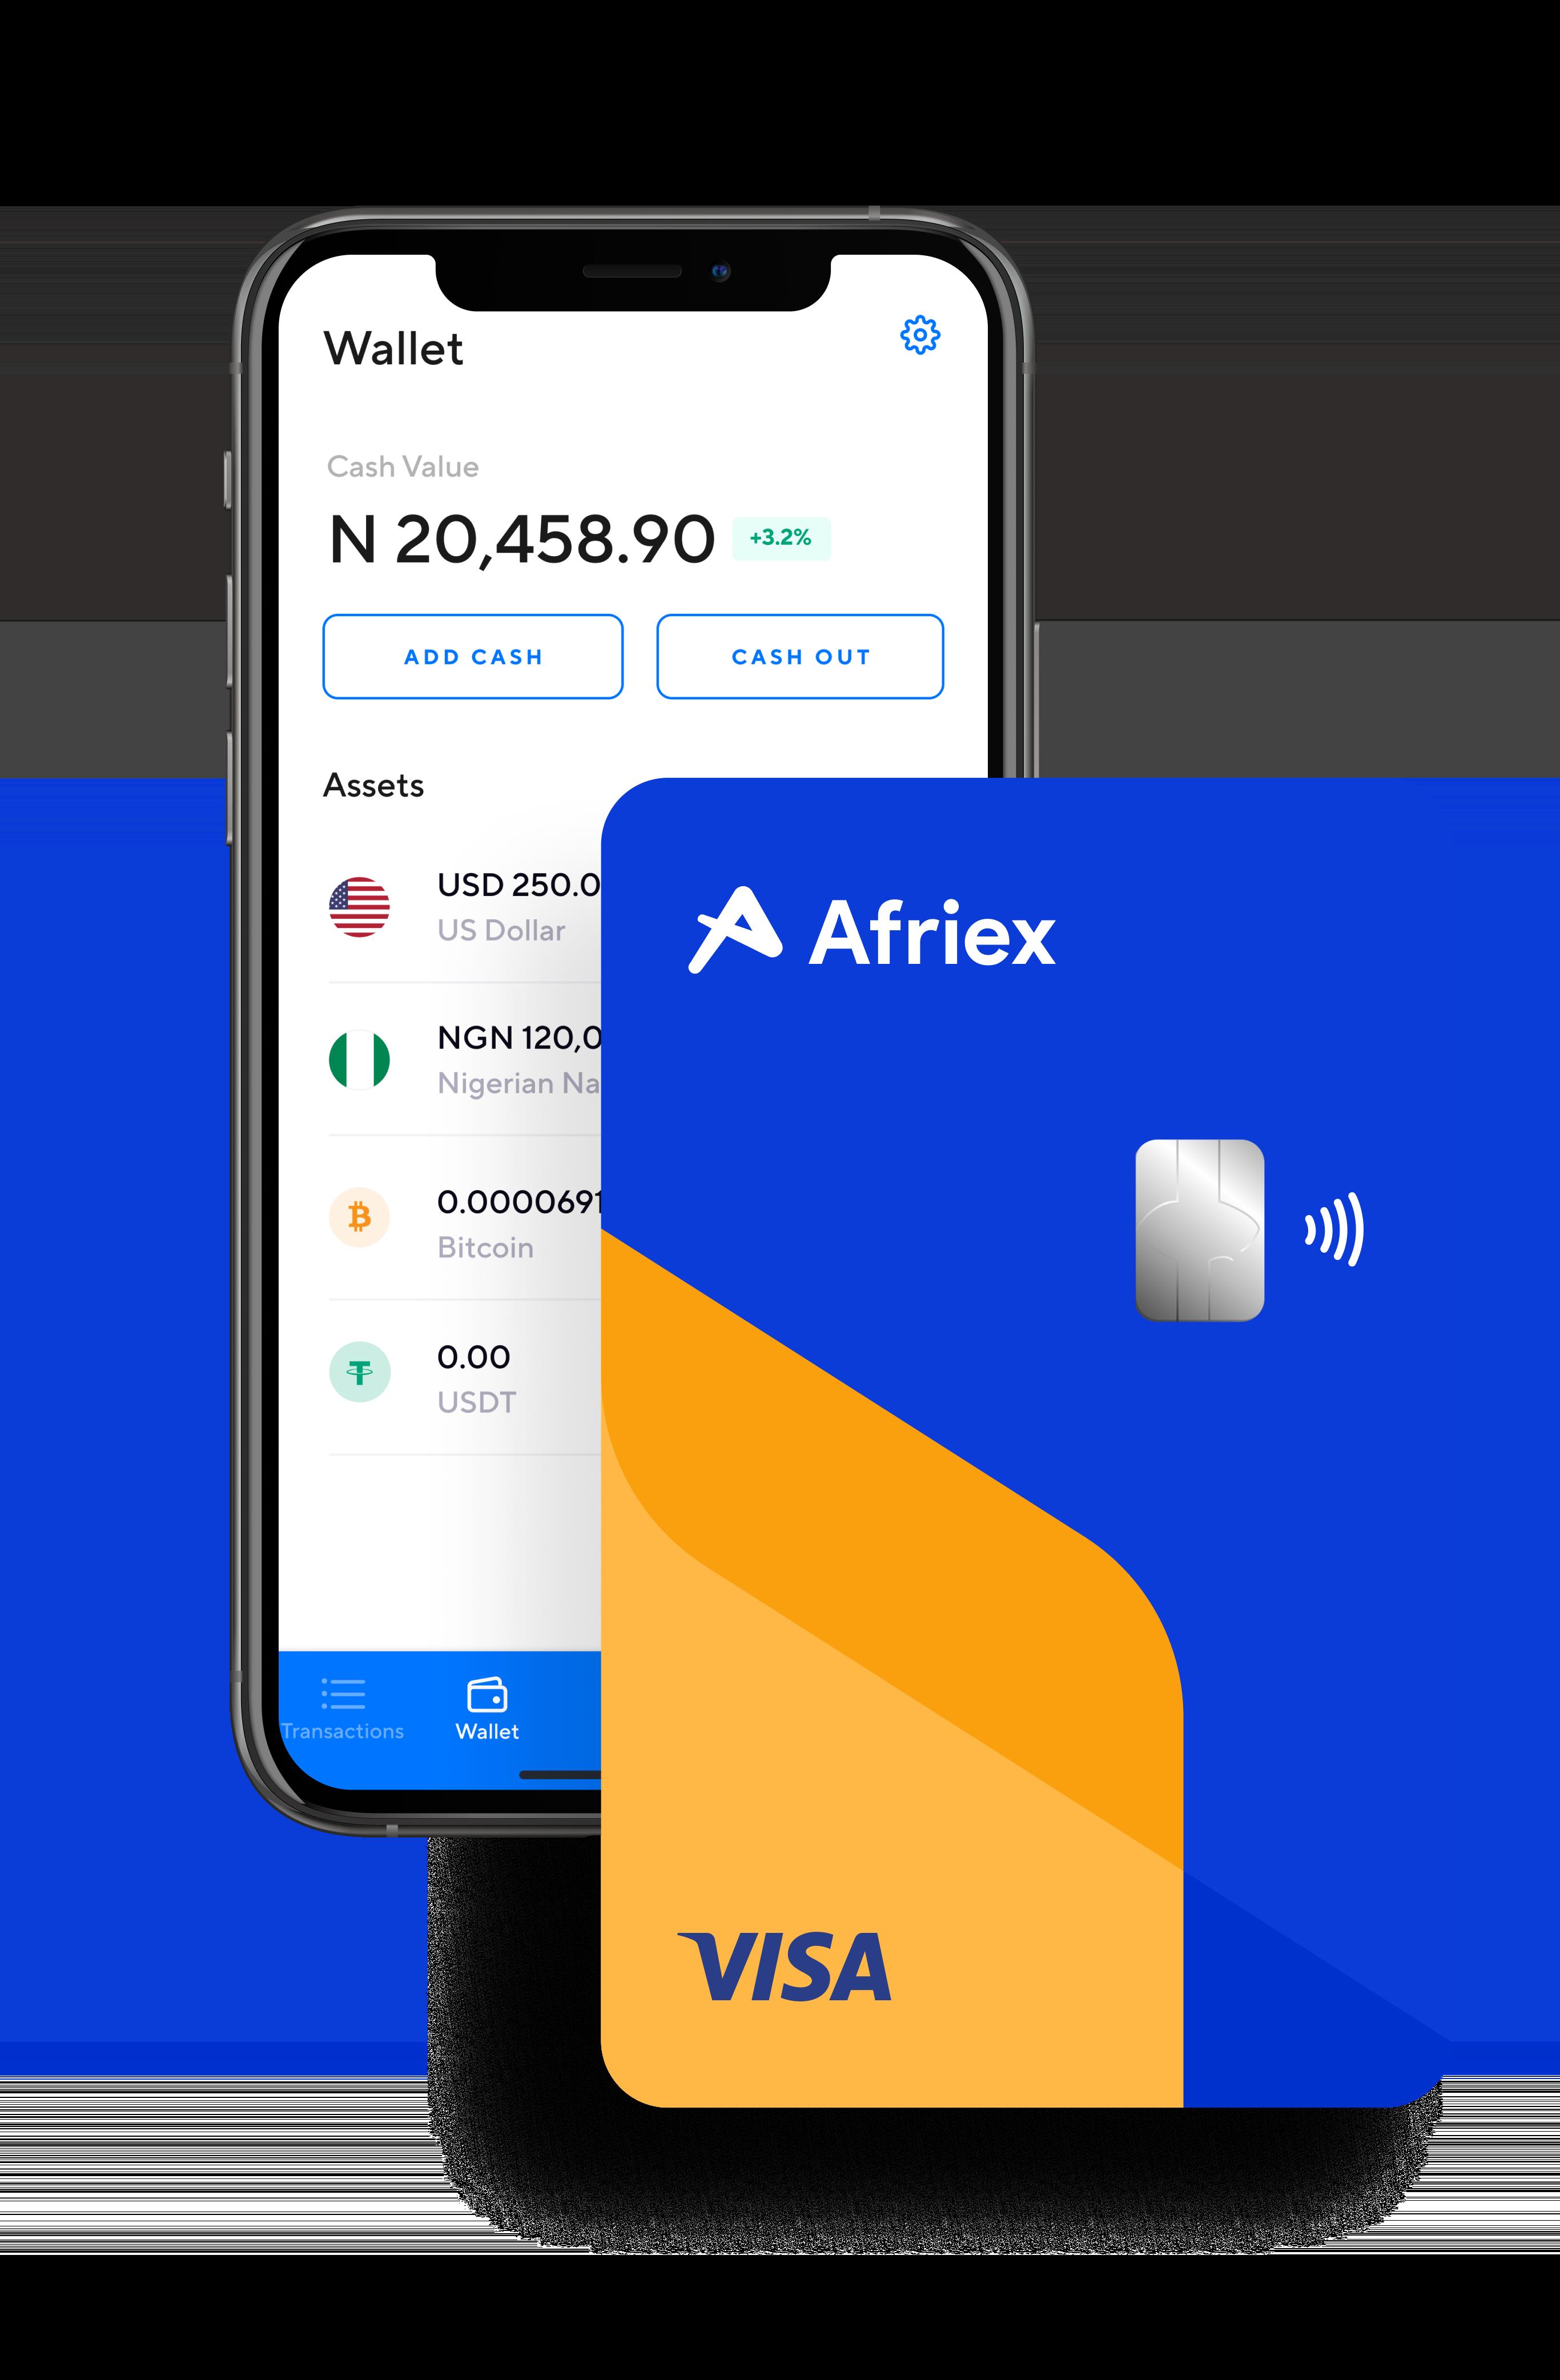 afriex app and visa card